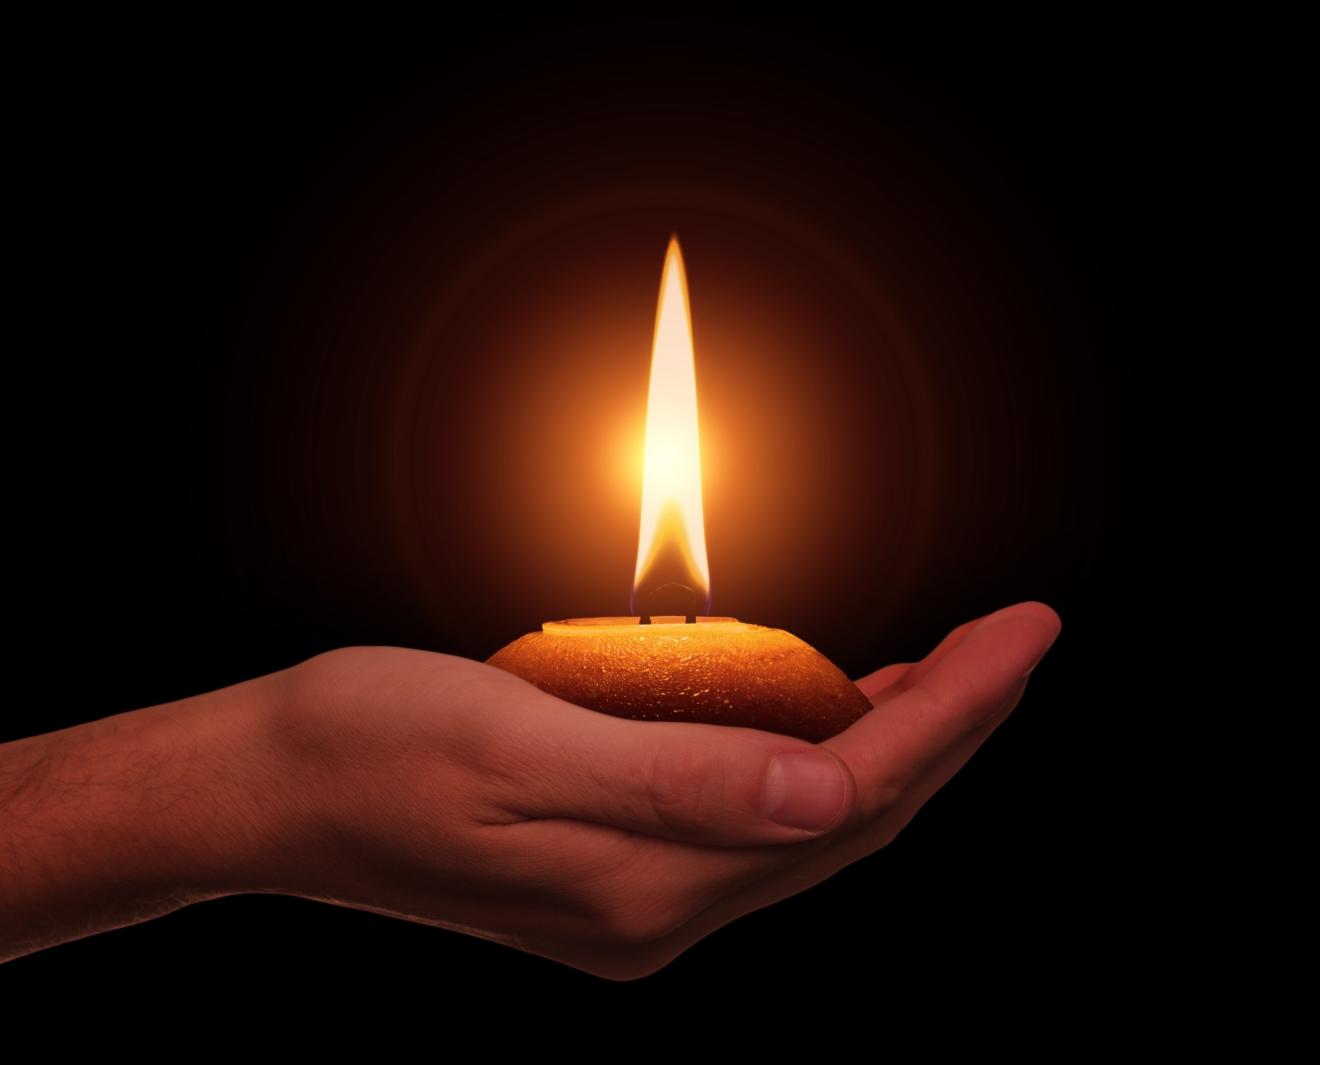 In memoriam Tinnie Hofman - Renne (09/12/1941 - 16/01/2021)